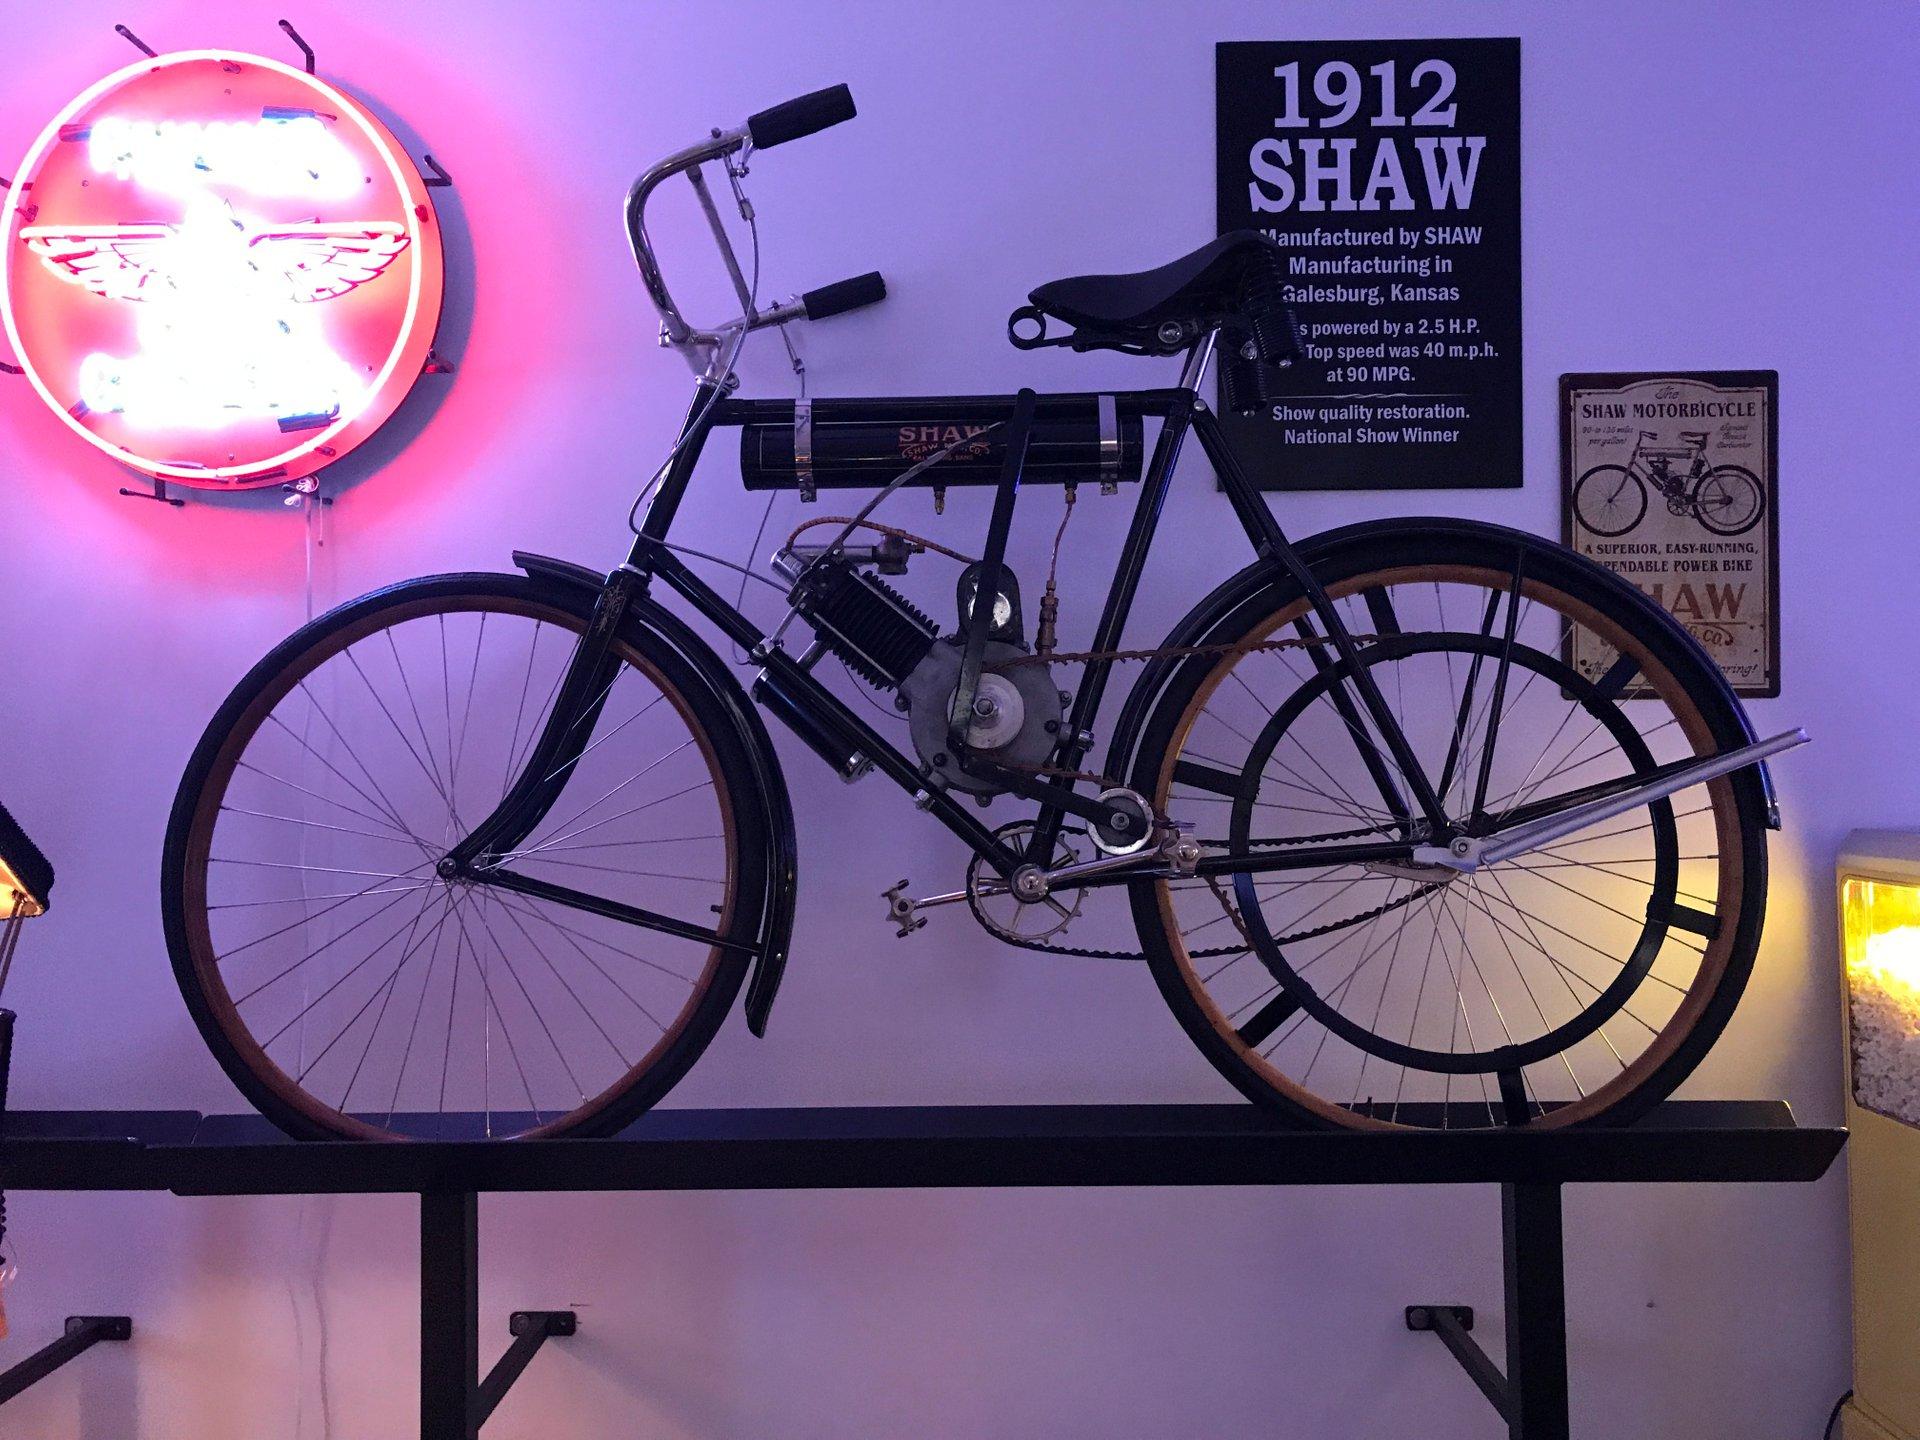 1912 shaw motorbicycle